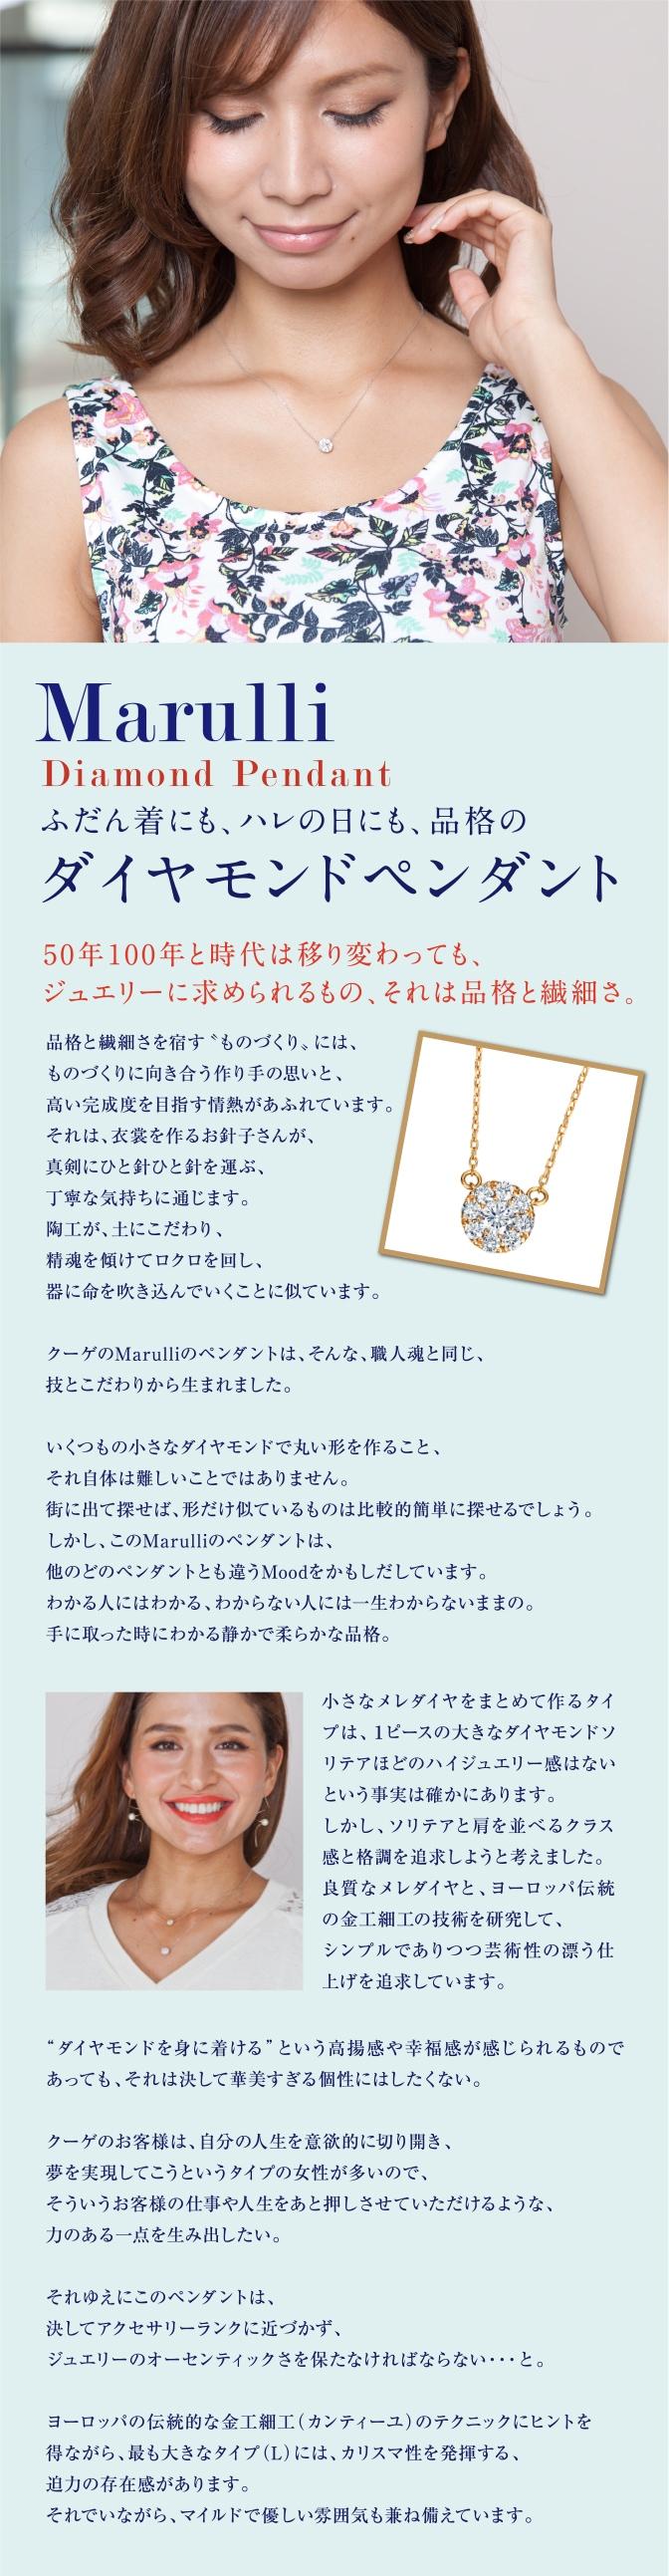 Marulli Diamond Pendant 普段着にも、ハレの日にも、品格のダイヤモンドペンダント